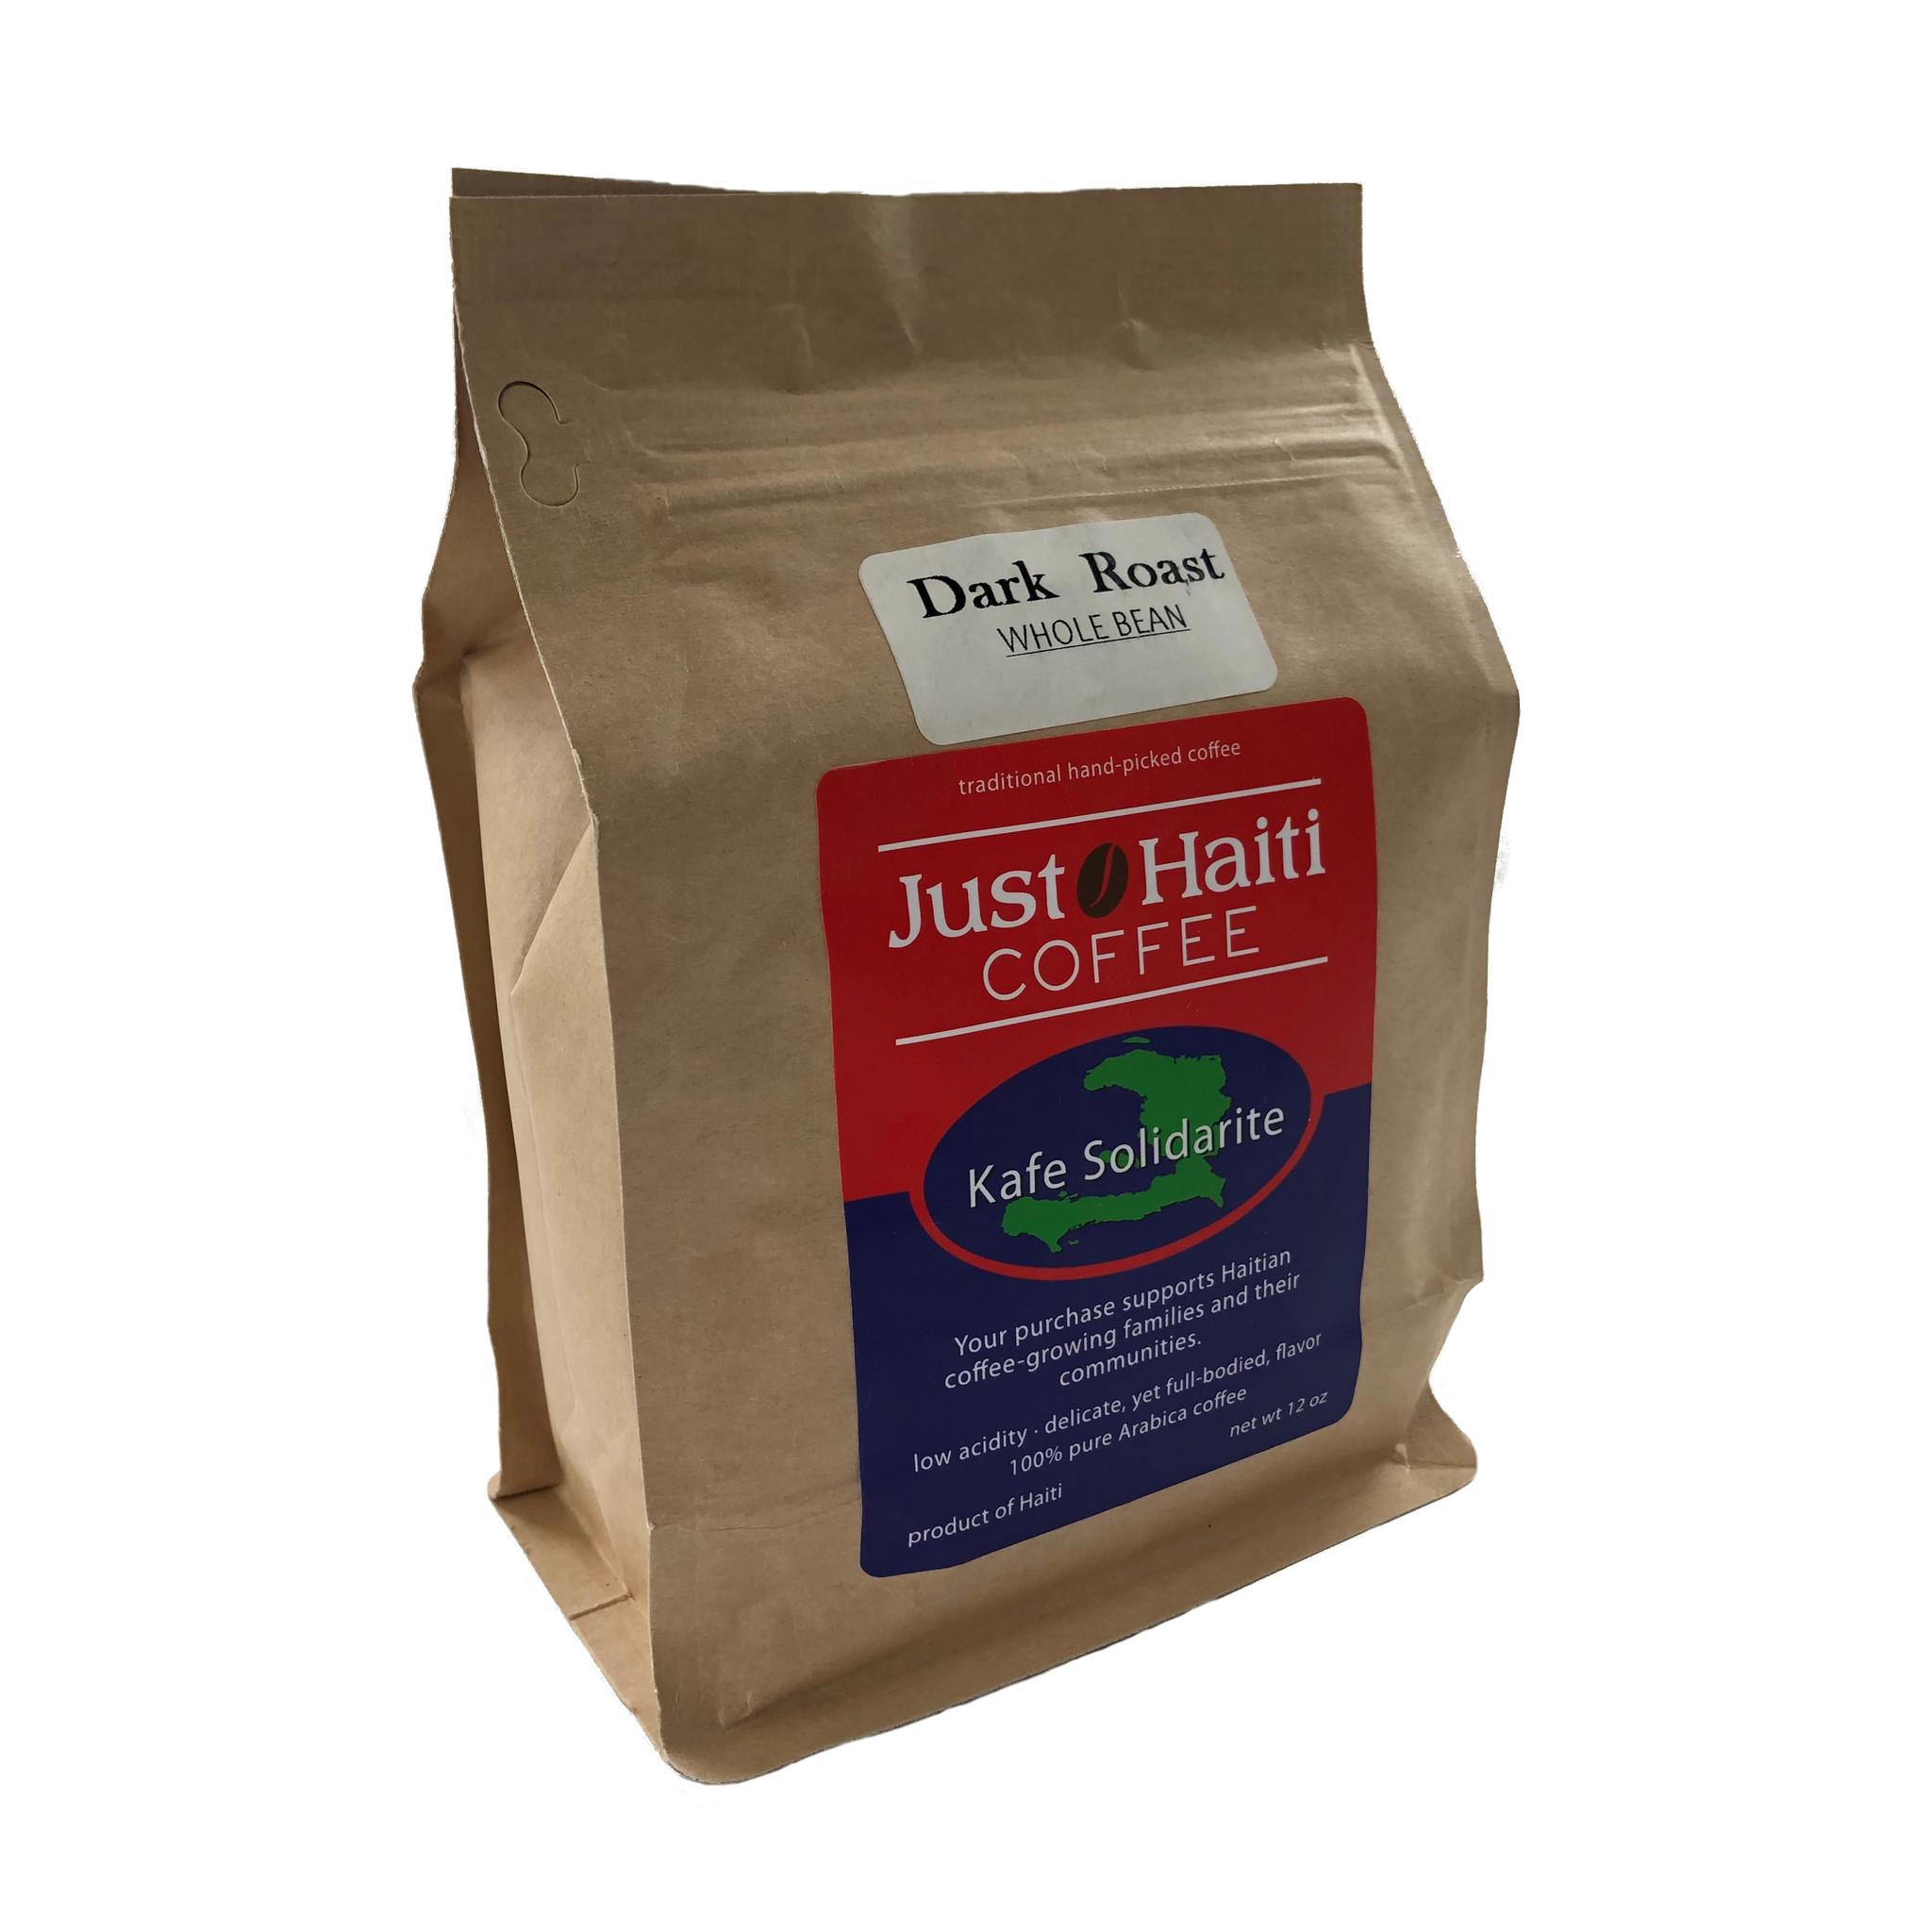 Just Haiti Dark Roast Whole Bean Coffee